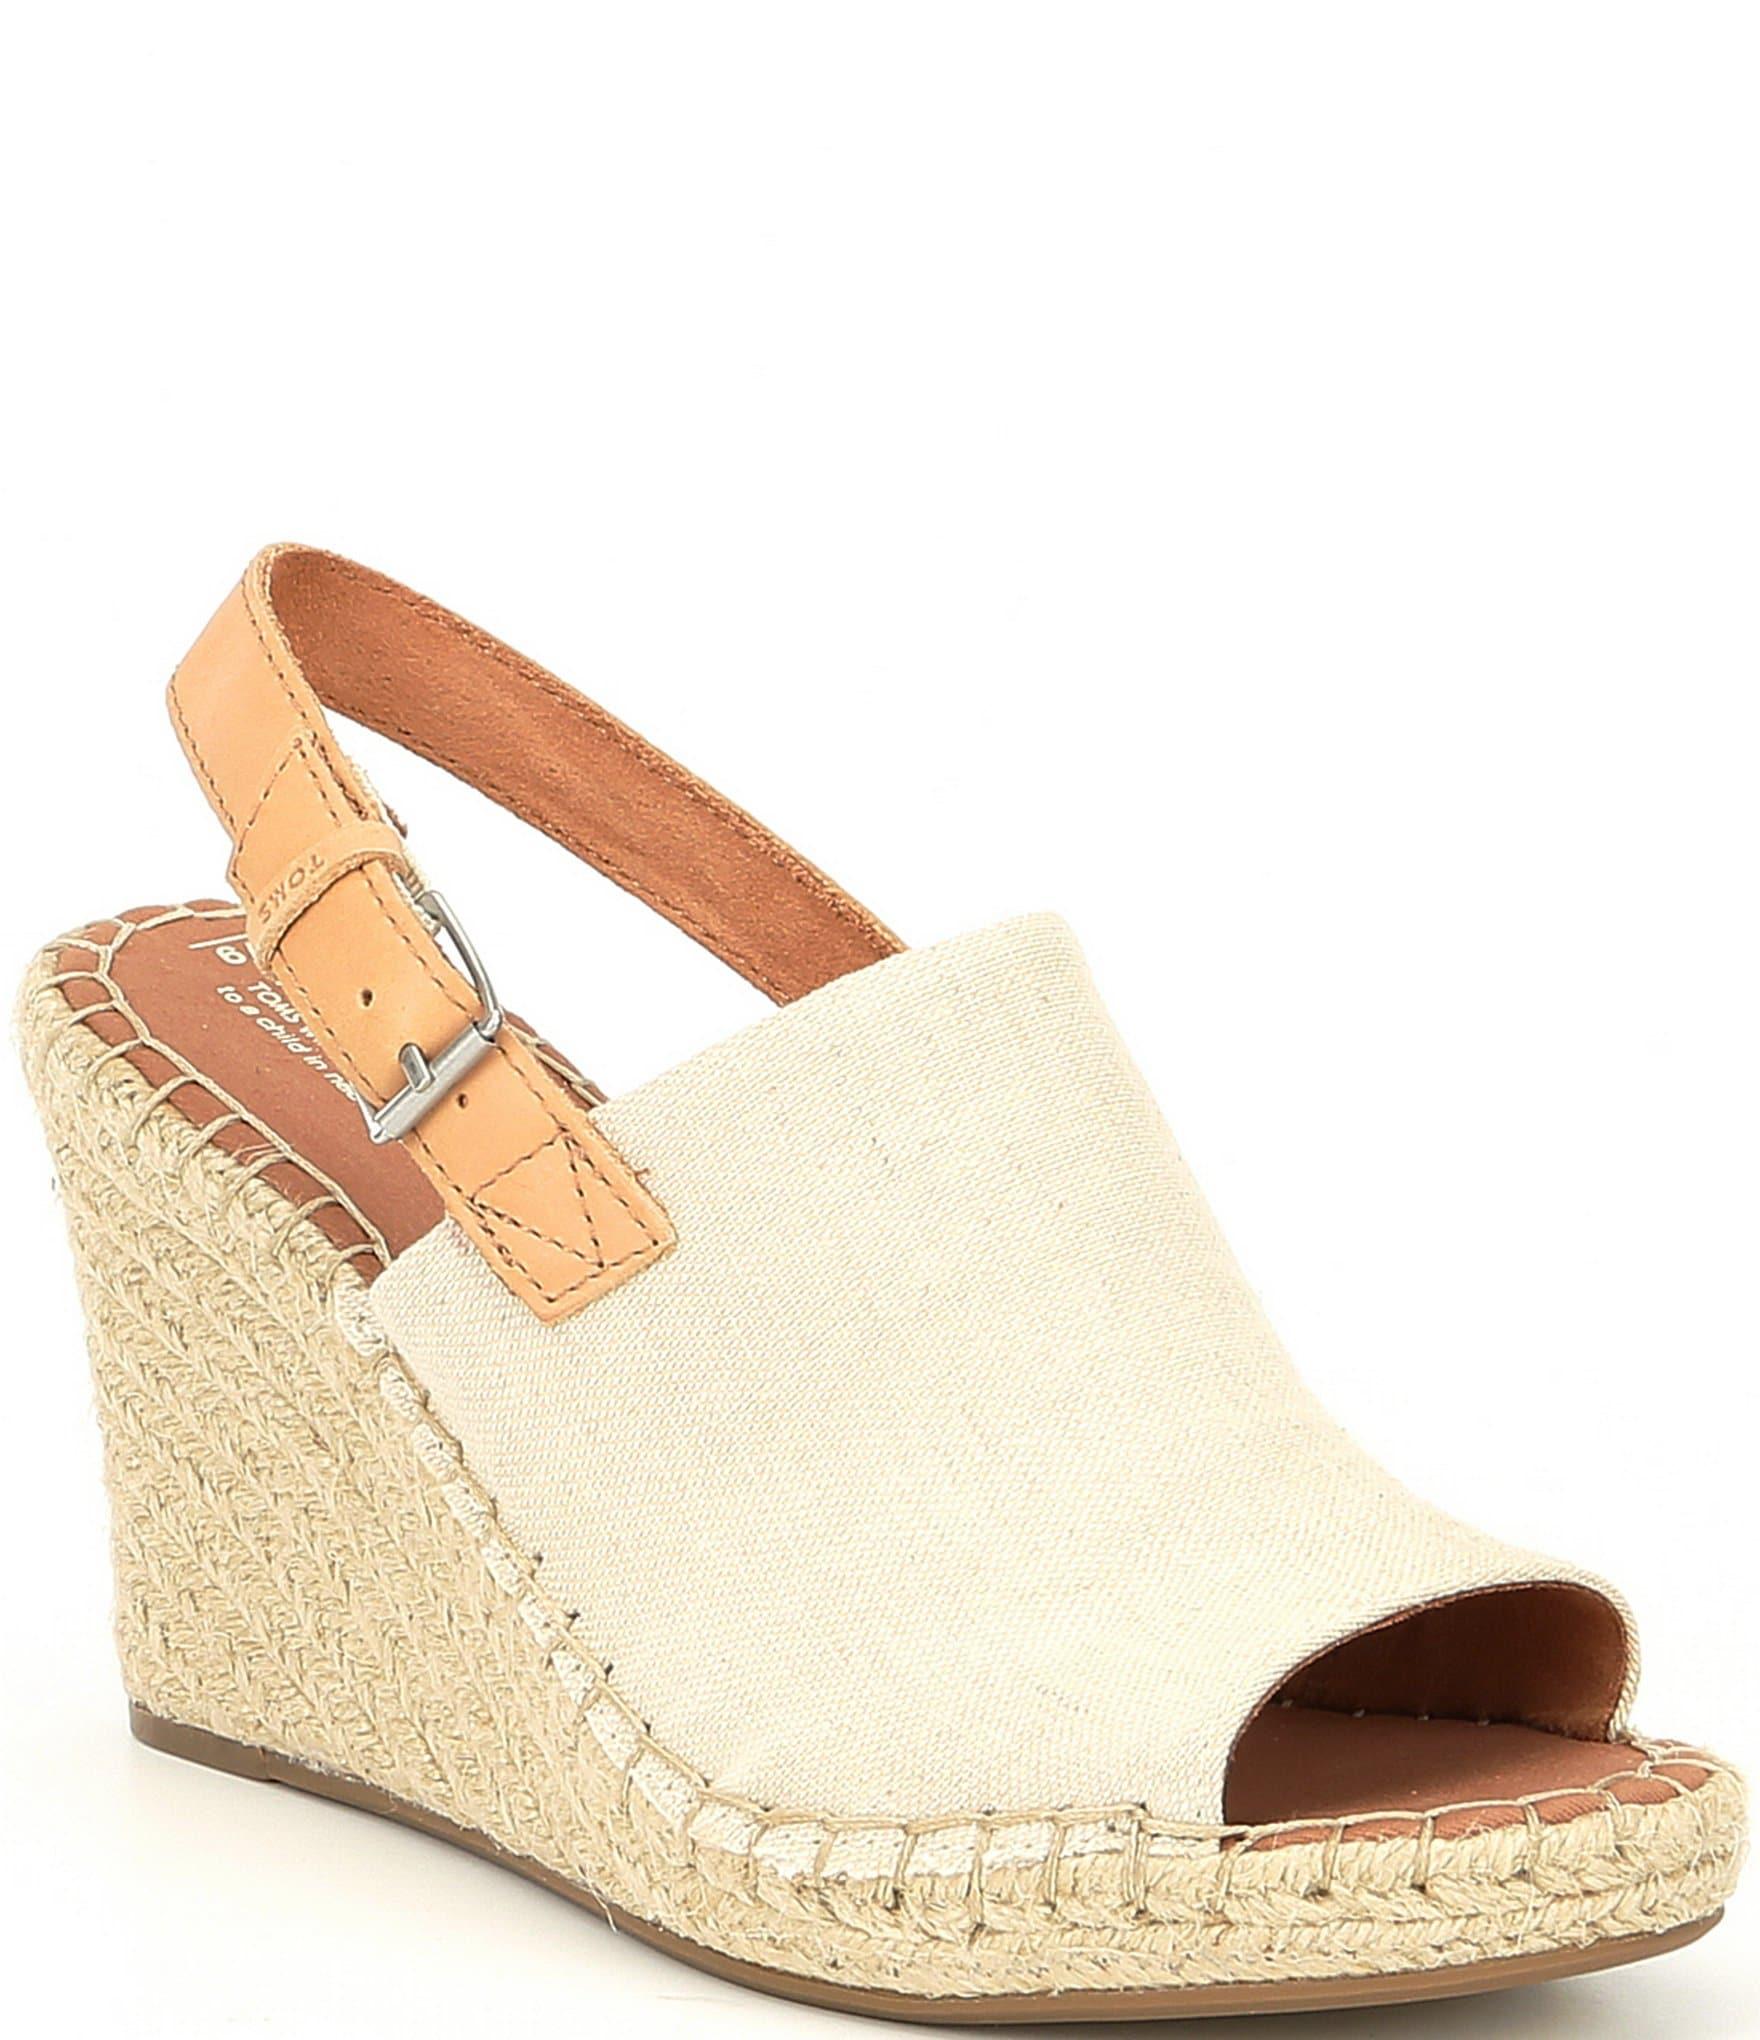 332c83ae9639 TOMS Monica Hemp Wedge Espadrille Sandals